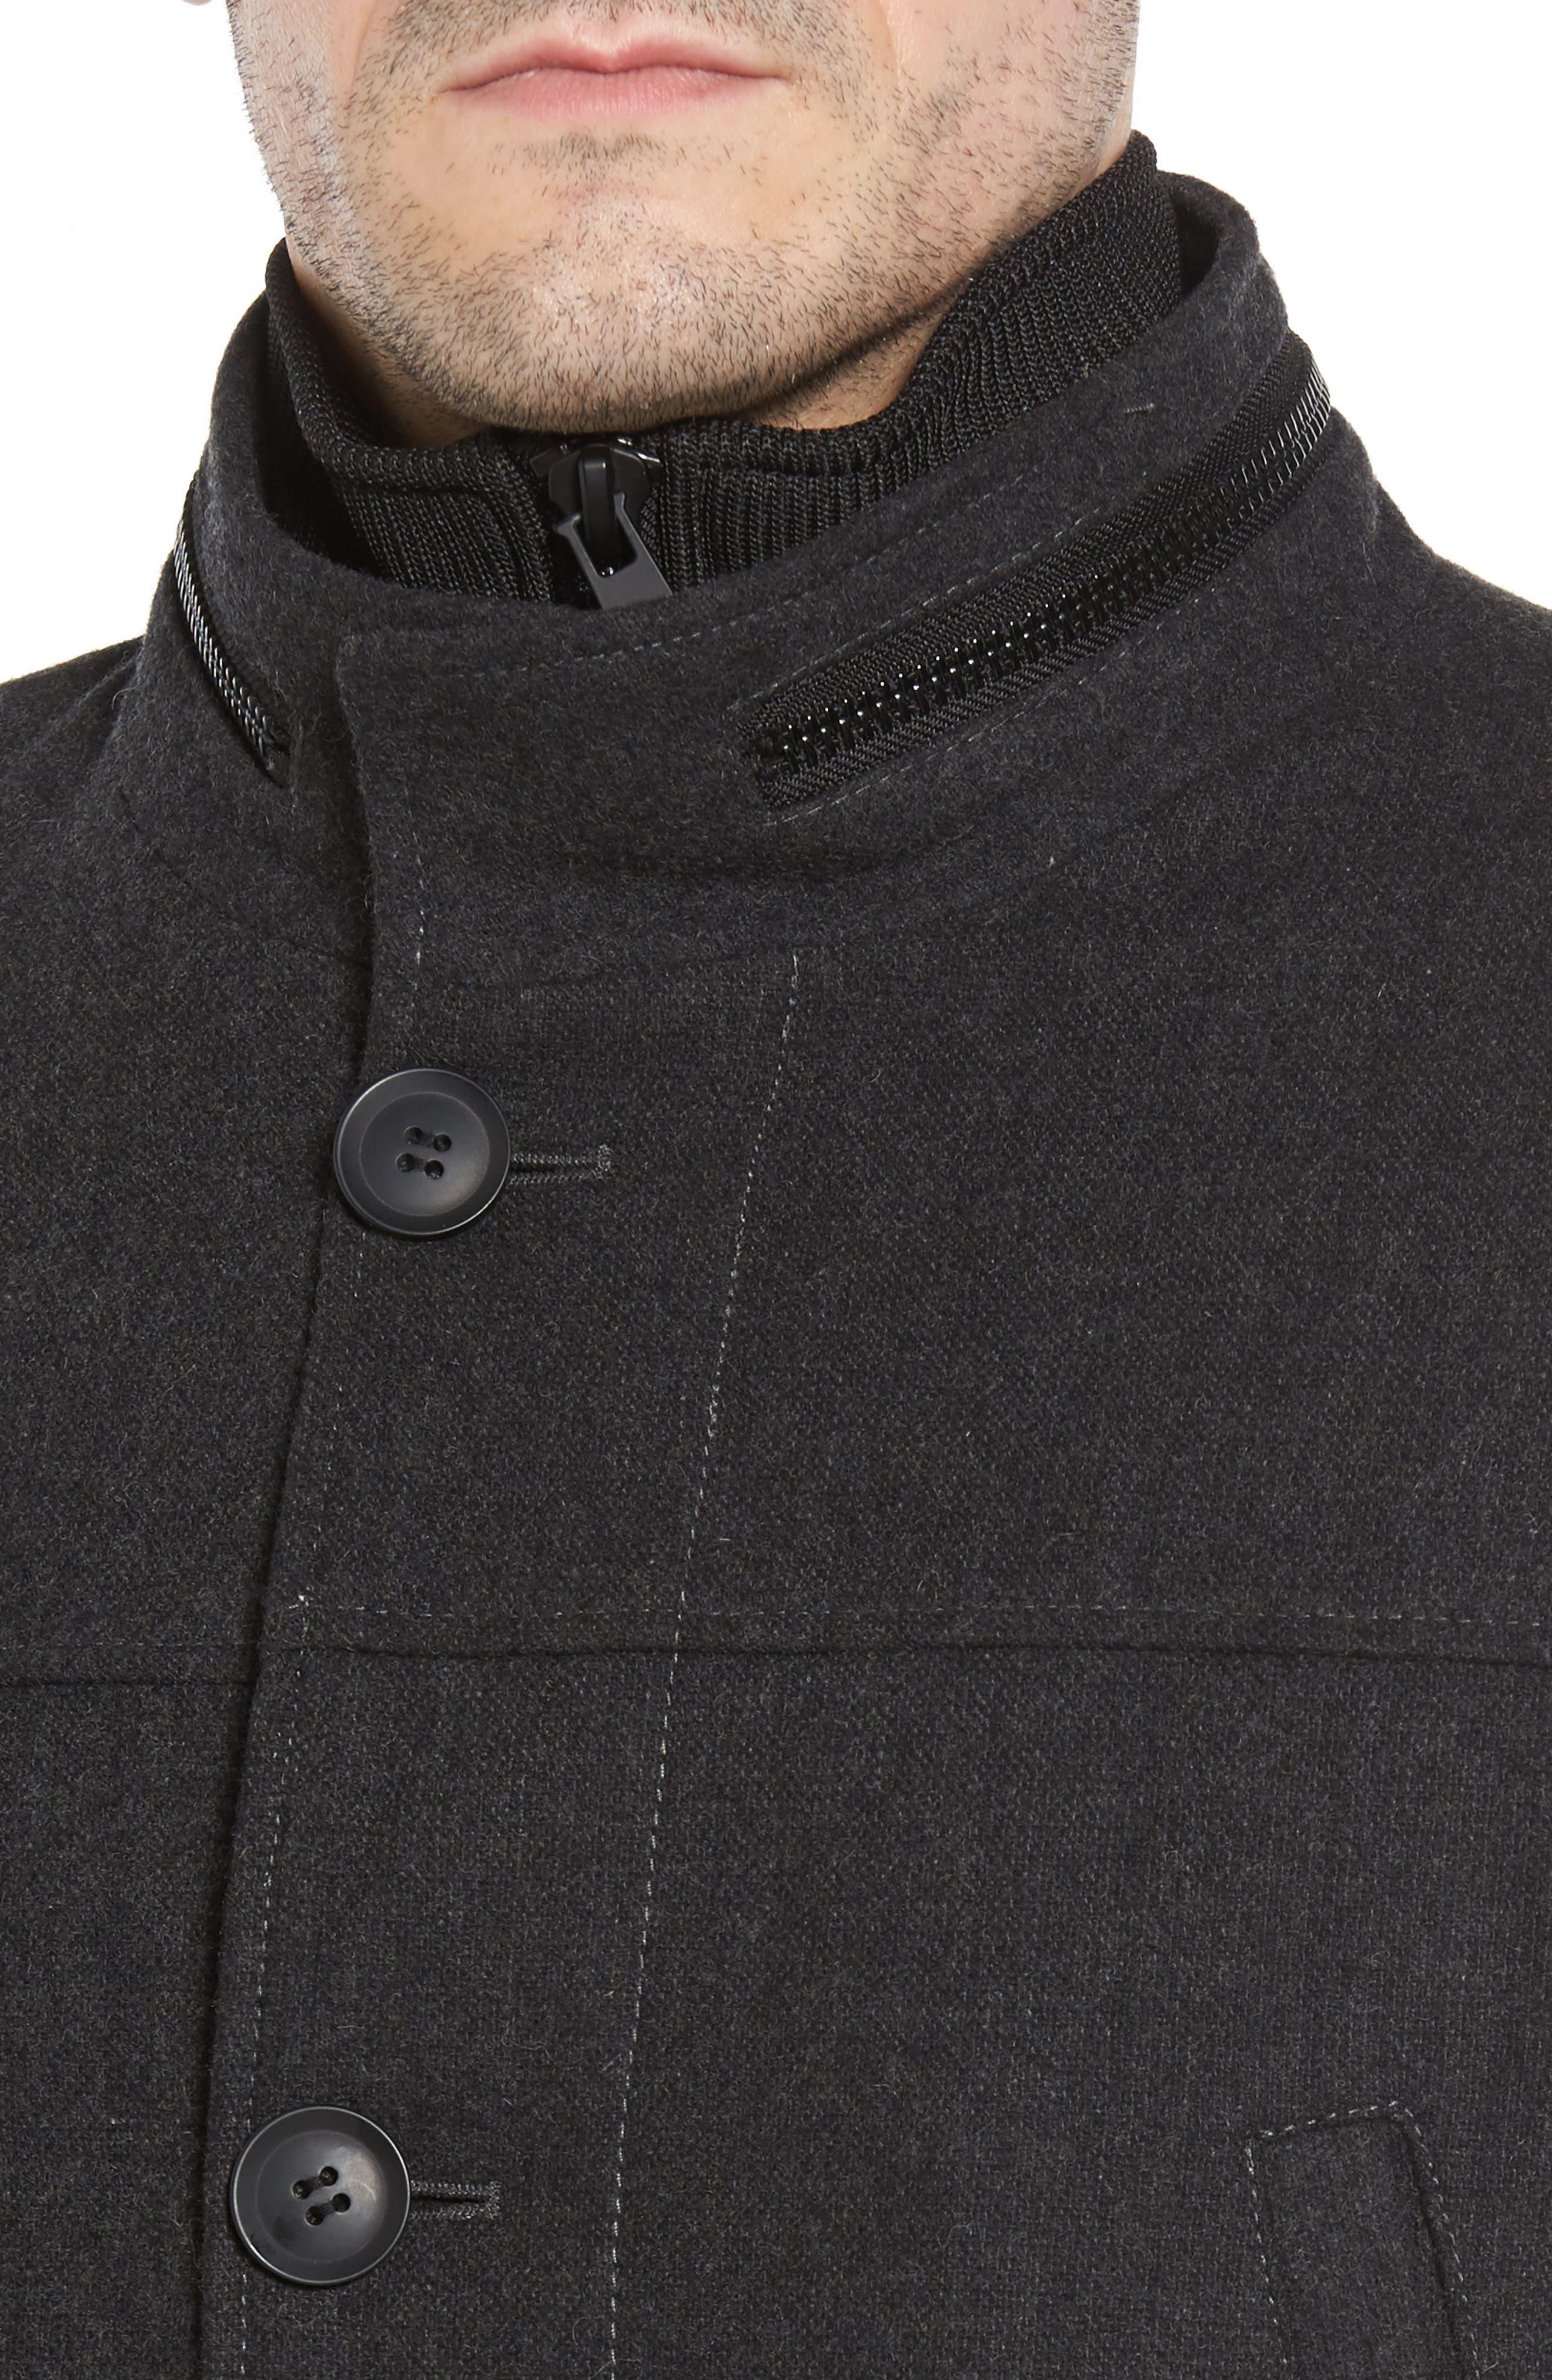 Button Front Coat,                             Alternate thumbnail 4, color,                             Charcoal